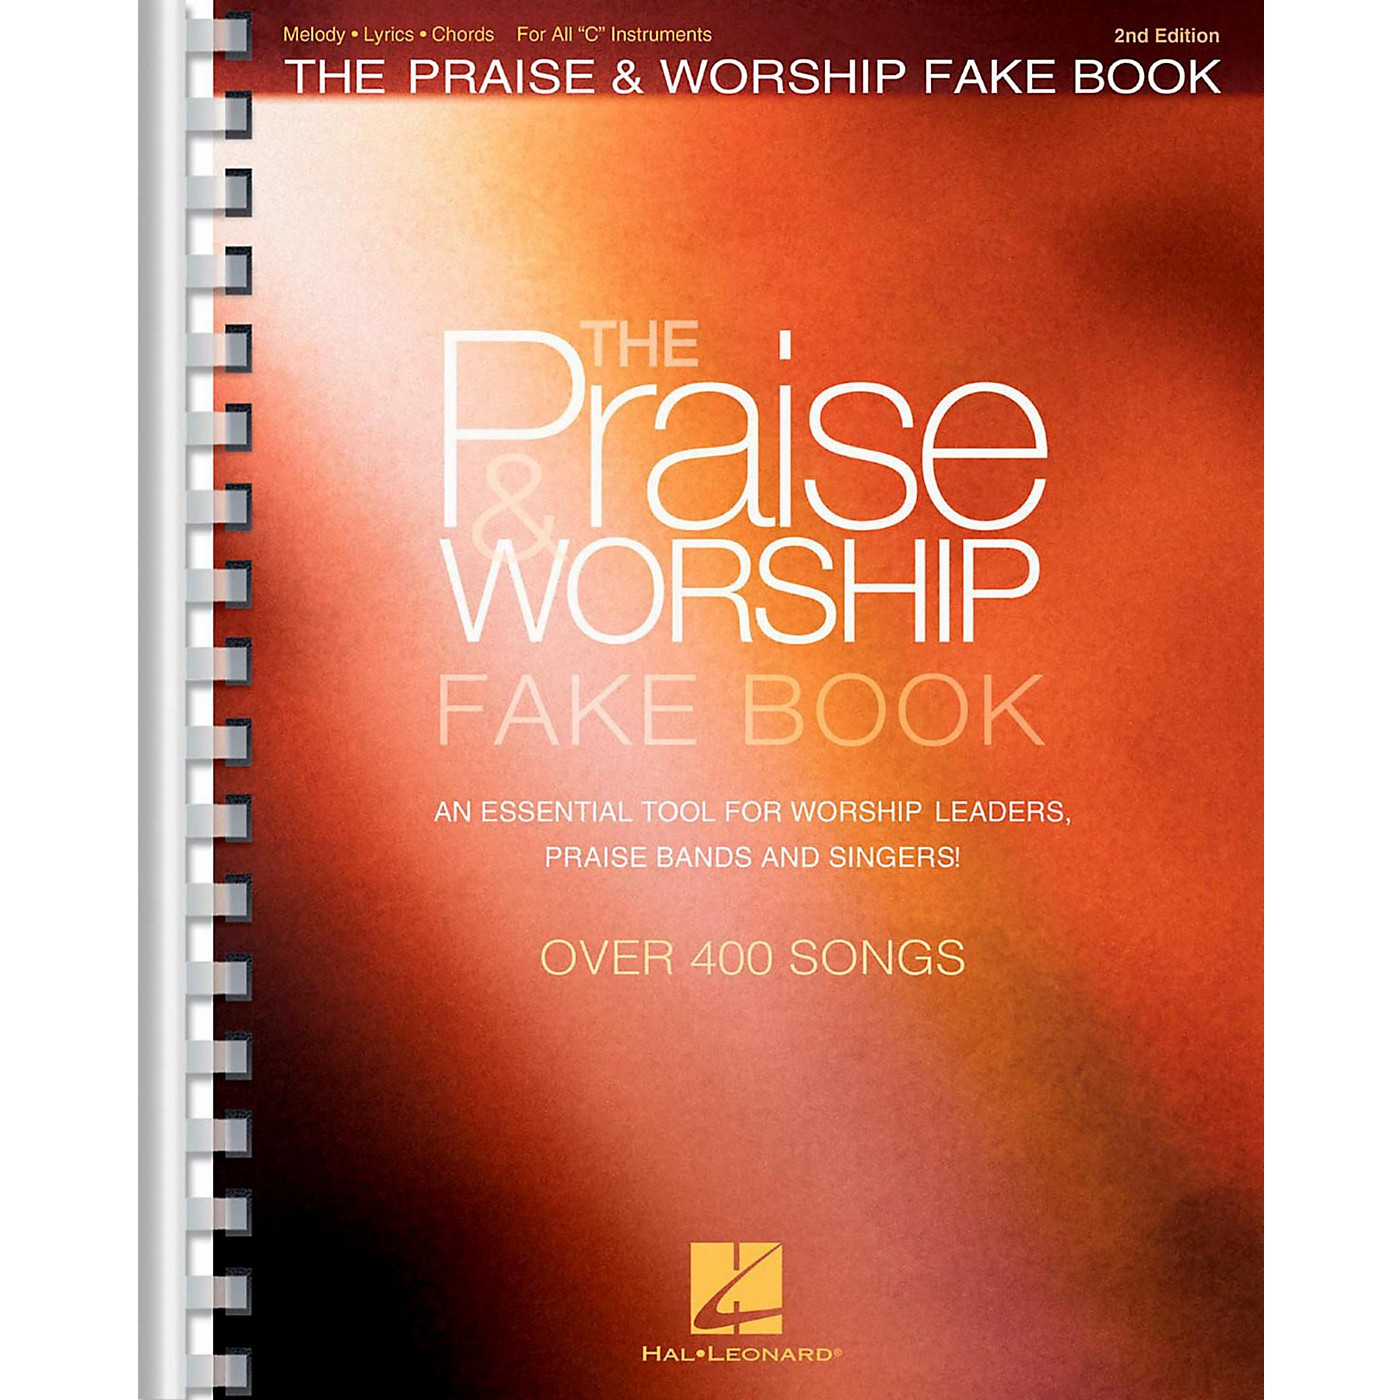 Hal Leonard The Praise & Worship Fake Book - 2nd Edition (C Instruments) thumbnail